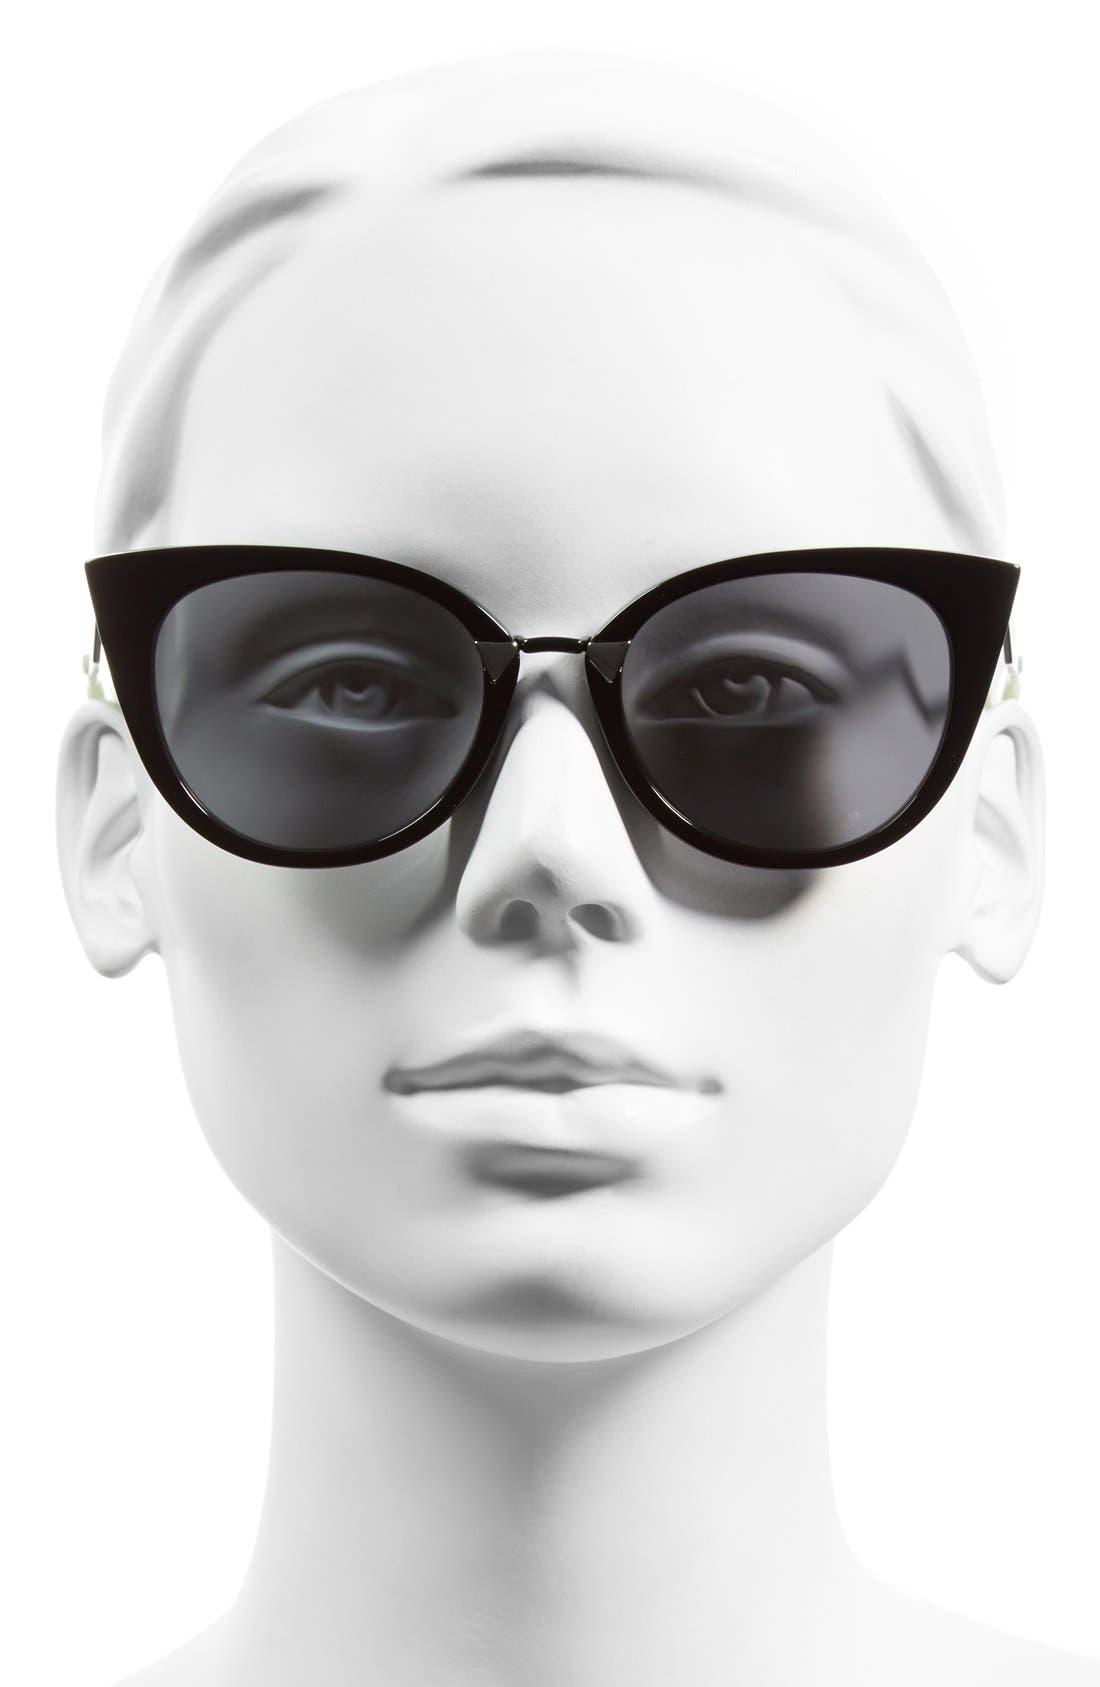 52mm Cat Eye Sunglasses,                             Alternate thumbnail 6, color,